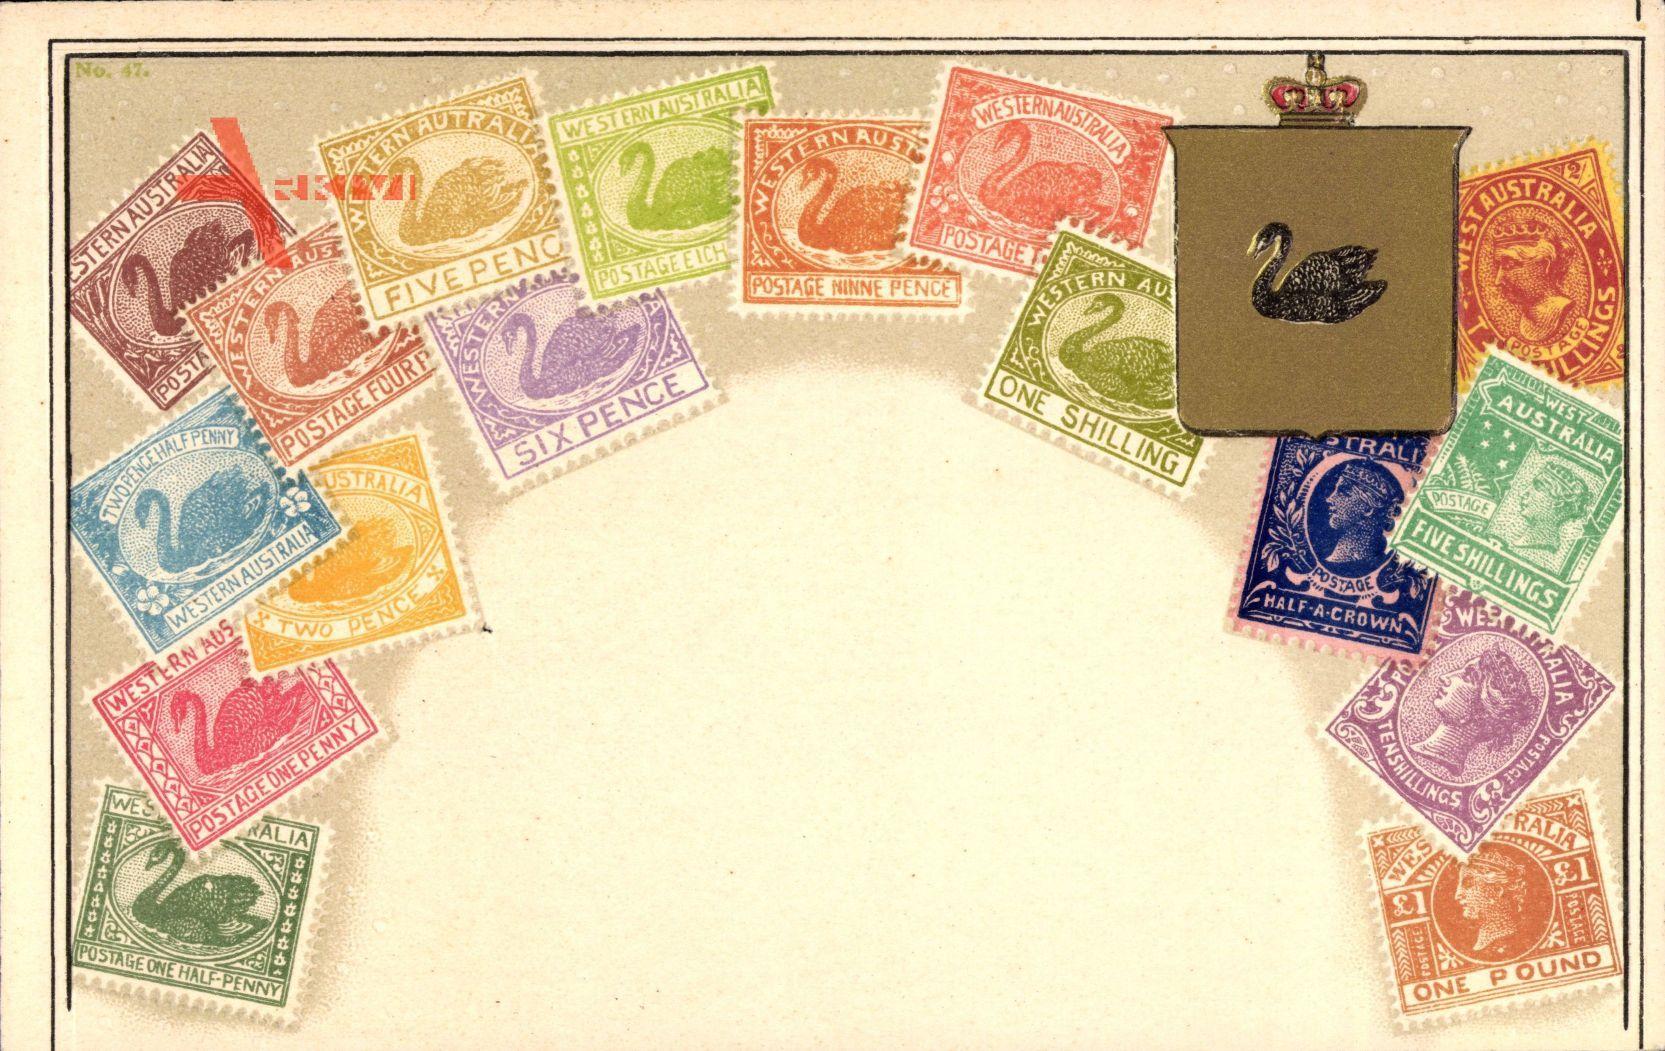 Briefmarken Western Australia, Australien, Six Pence